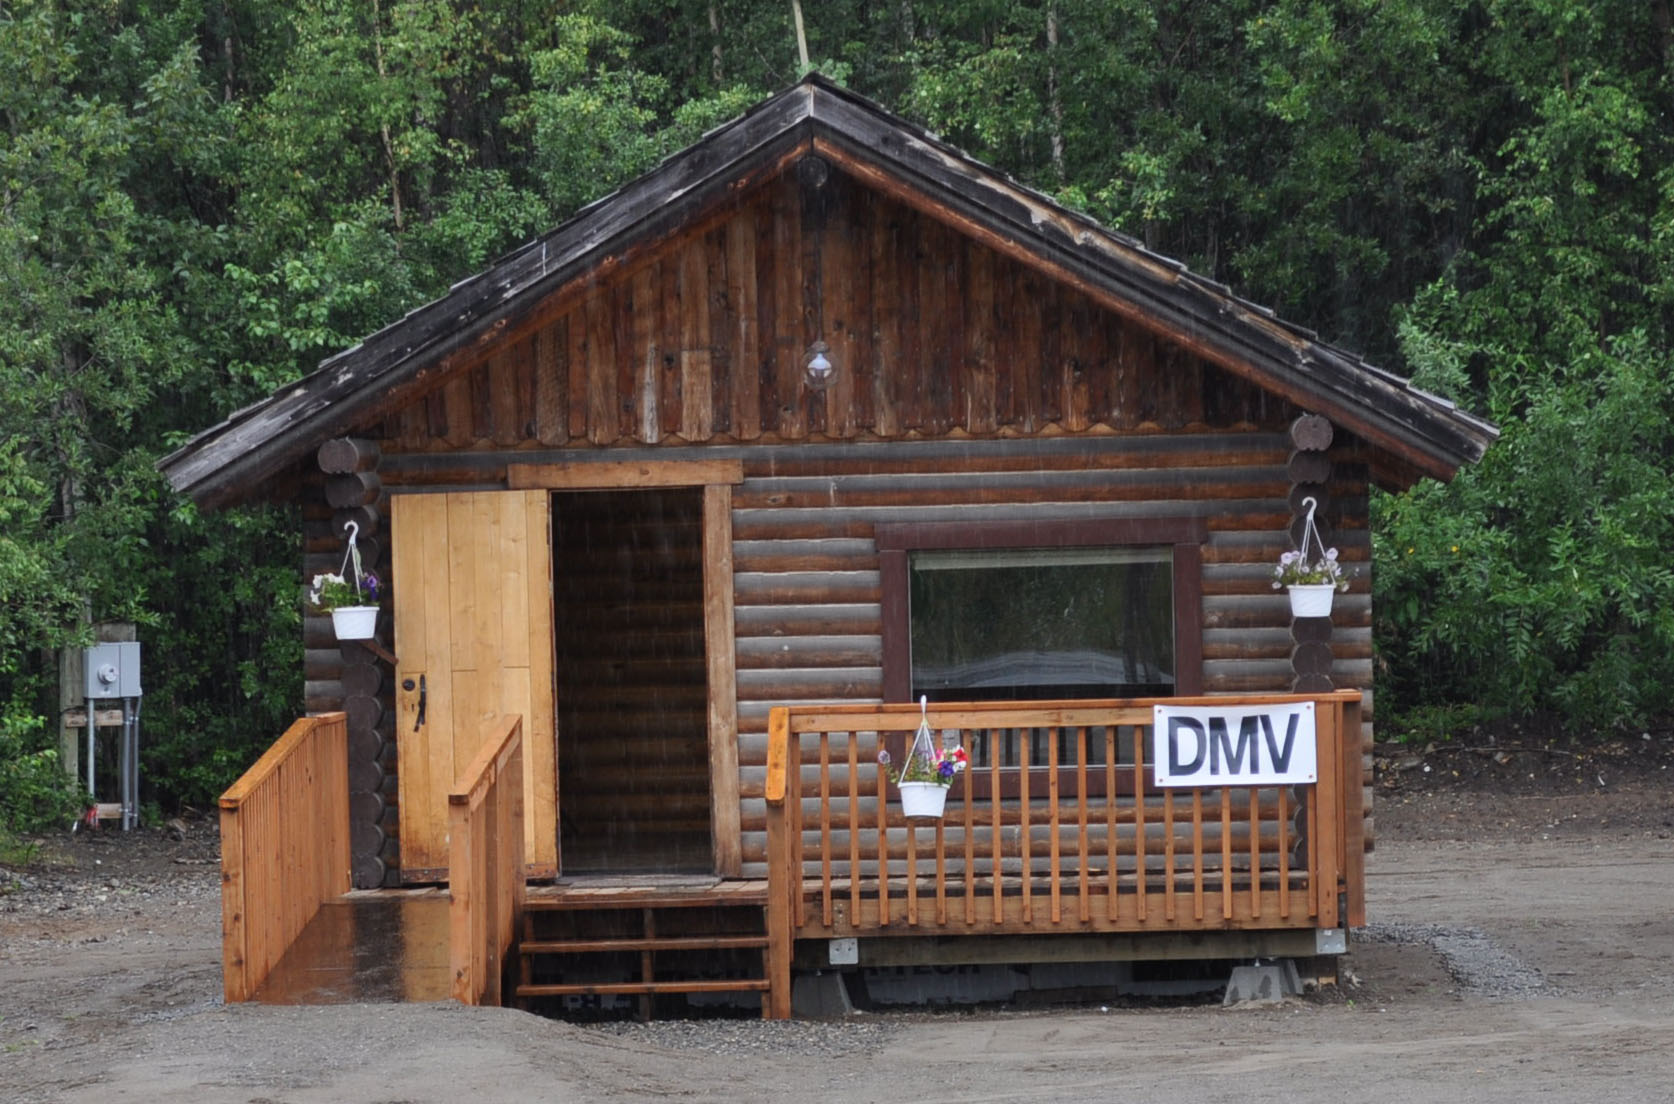 Talkeetna Dmv Division Of Motor Vehicles Department Of Administration State Of Alaska